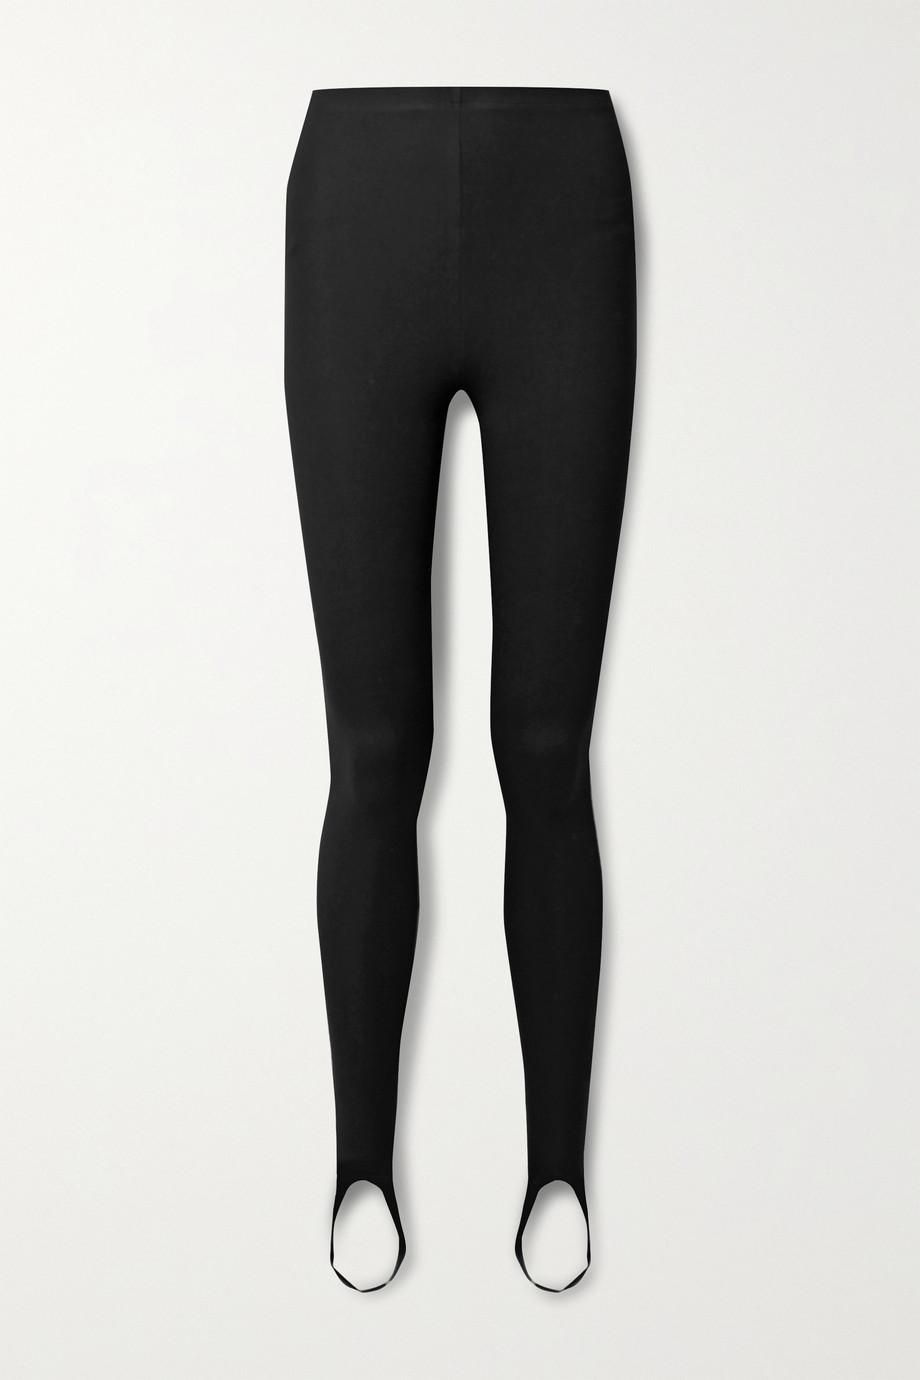 LESET Rio stretch-ponte stirrup leggings